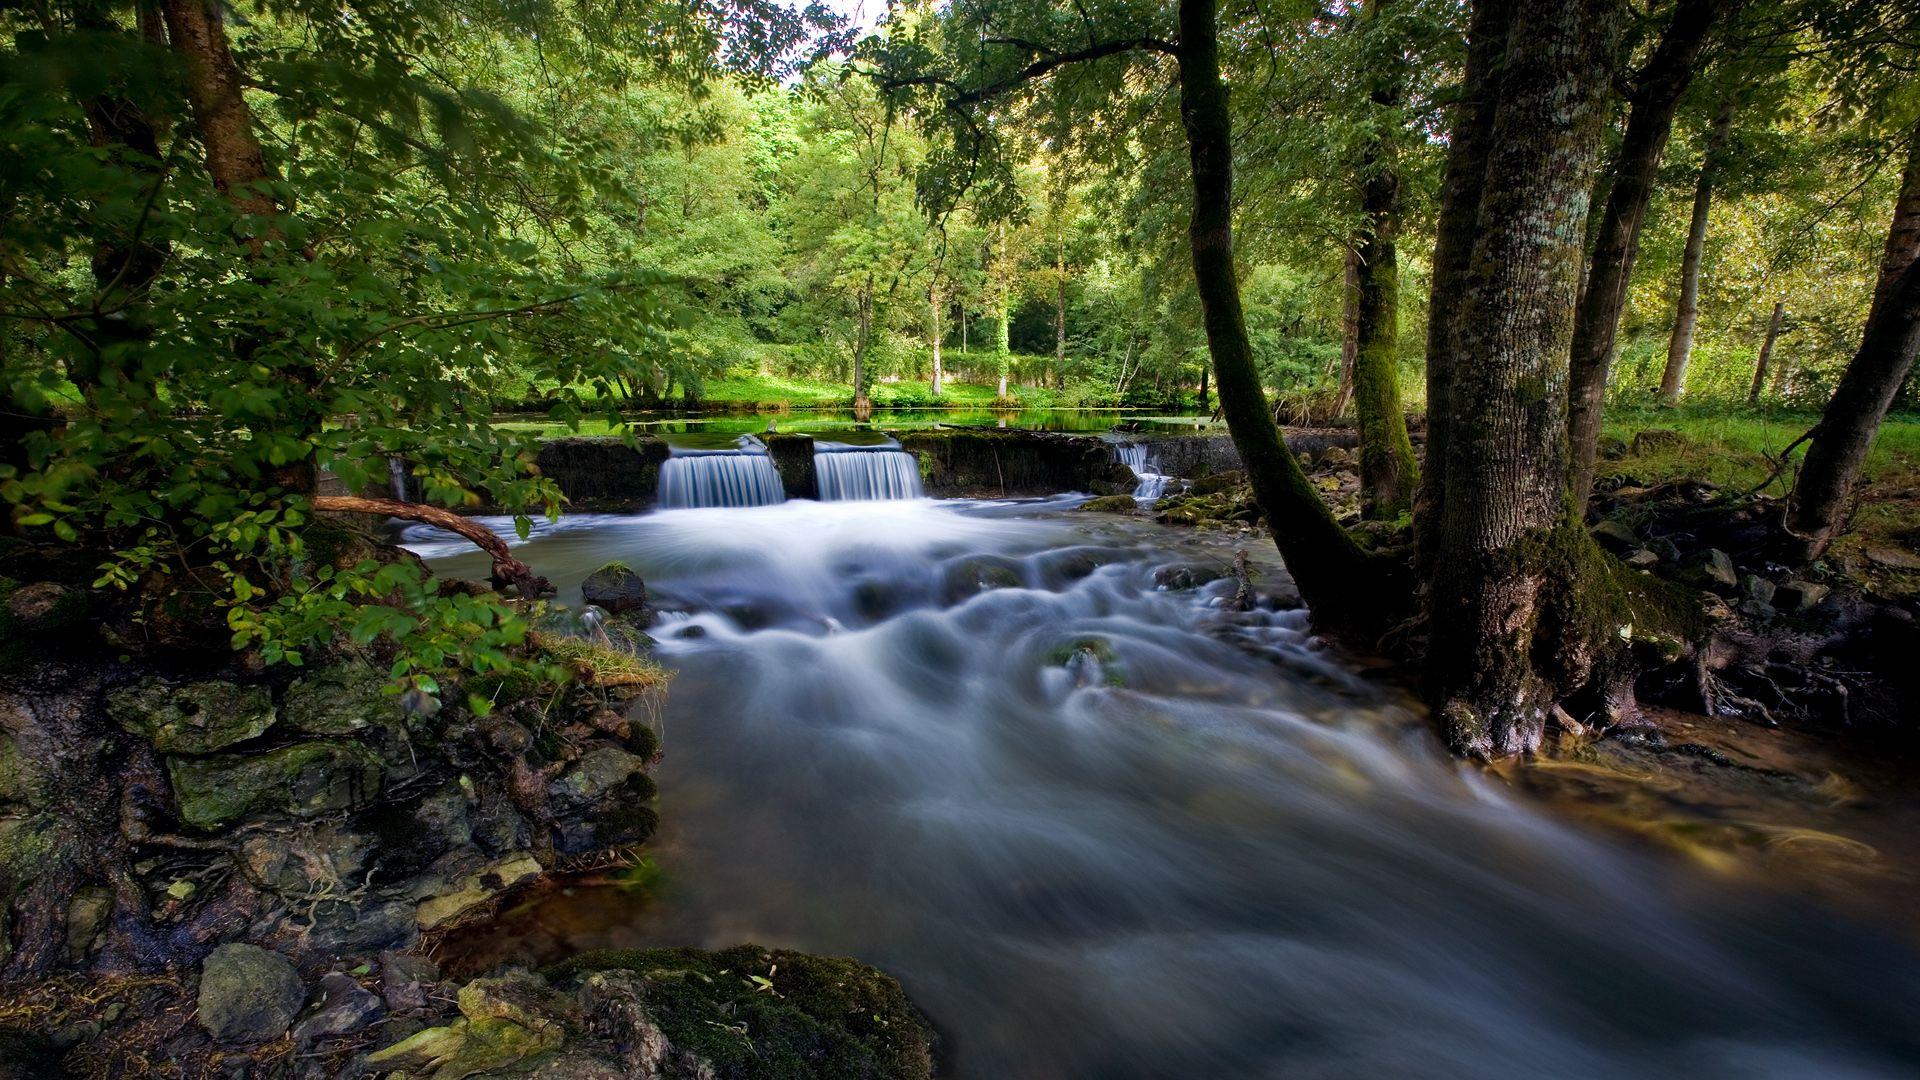 1080p Hd Wallpapers Landscape Waterfall Hd Wallpaper 1080p 9to5hdwallpapers Waterfall Wallpaper Nature Wallpaper Waterfall